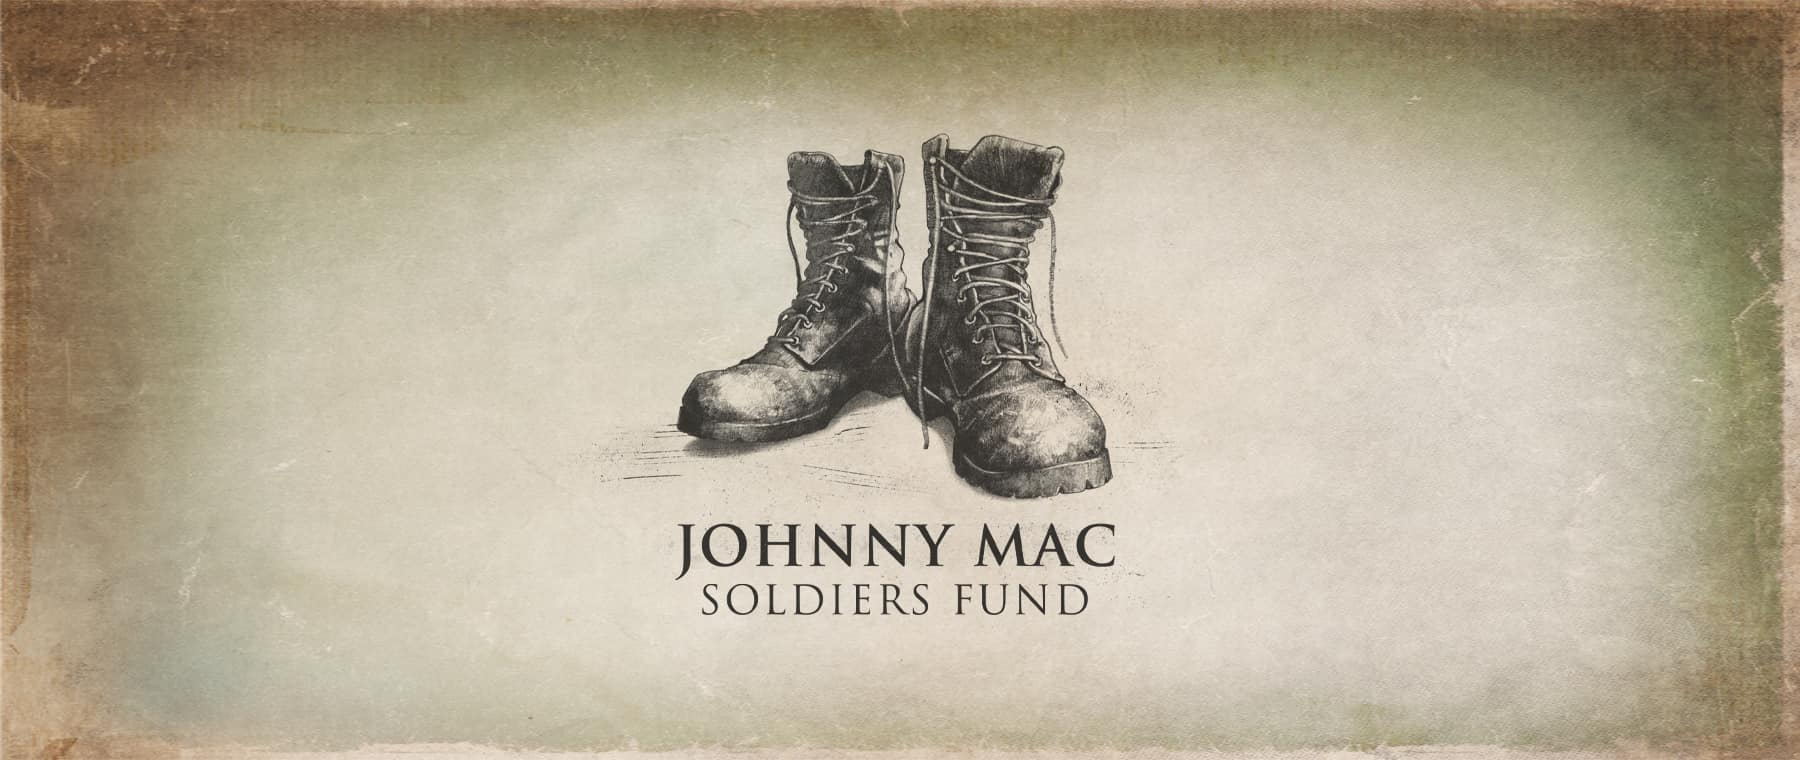 Johnny Mac Logo Dealer Website Carousel_1800x760